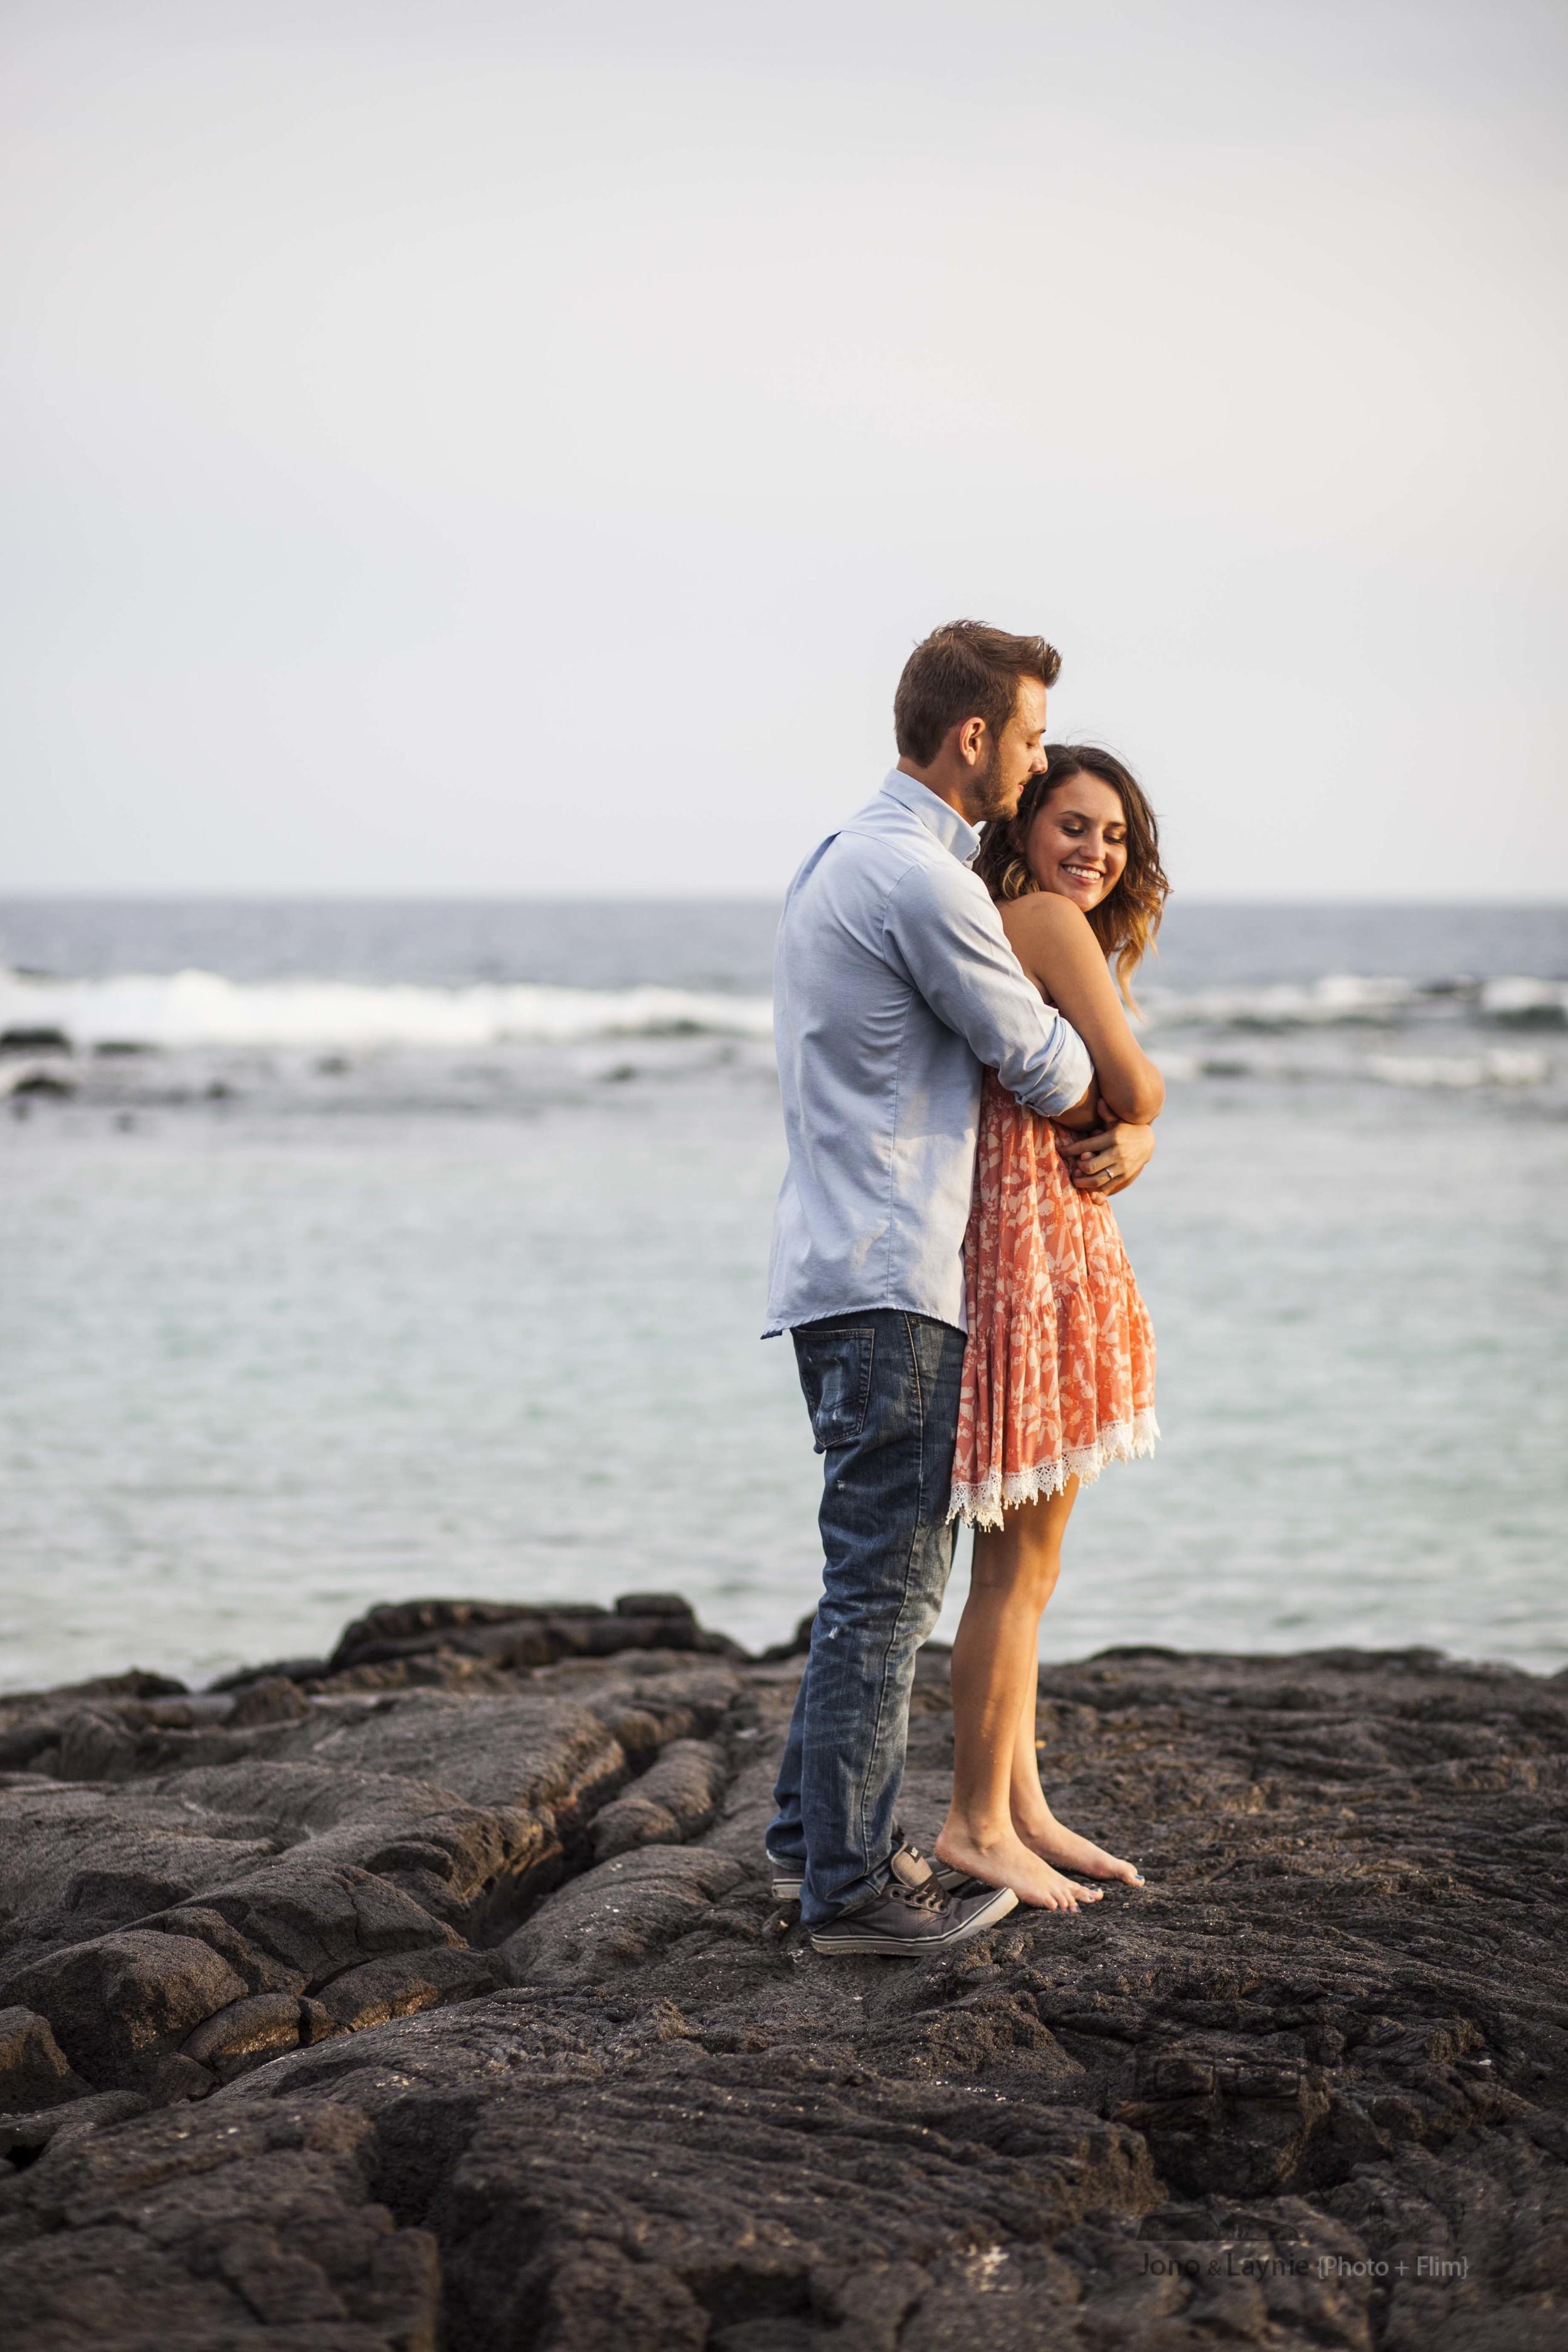 Jono & Laynie Co.-Kona, Hawaii-Engagement Session20.jpg